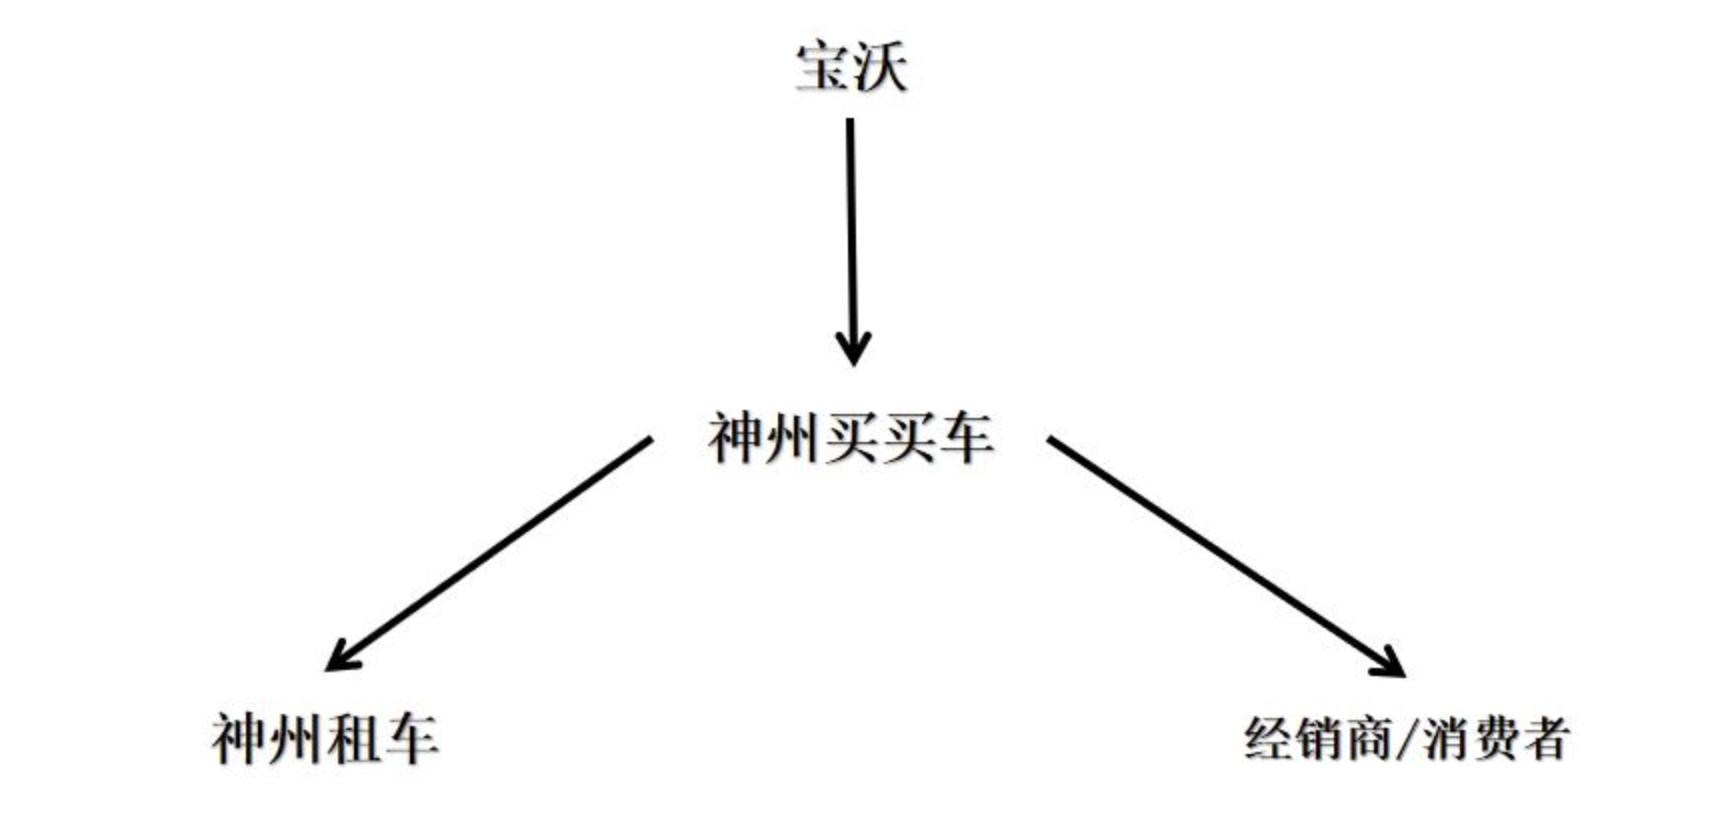 http://cools.qctt.cn/1580806888814.png